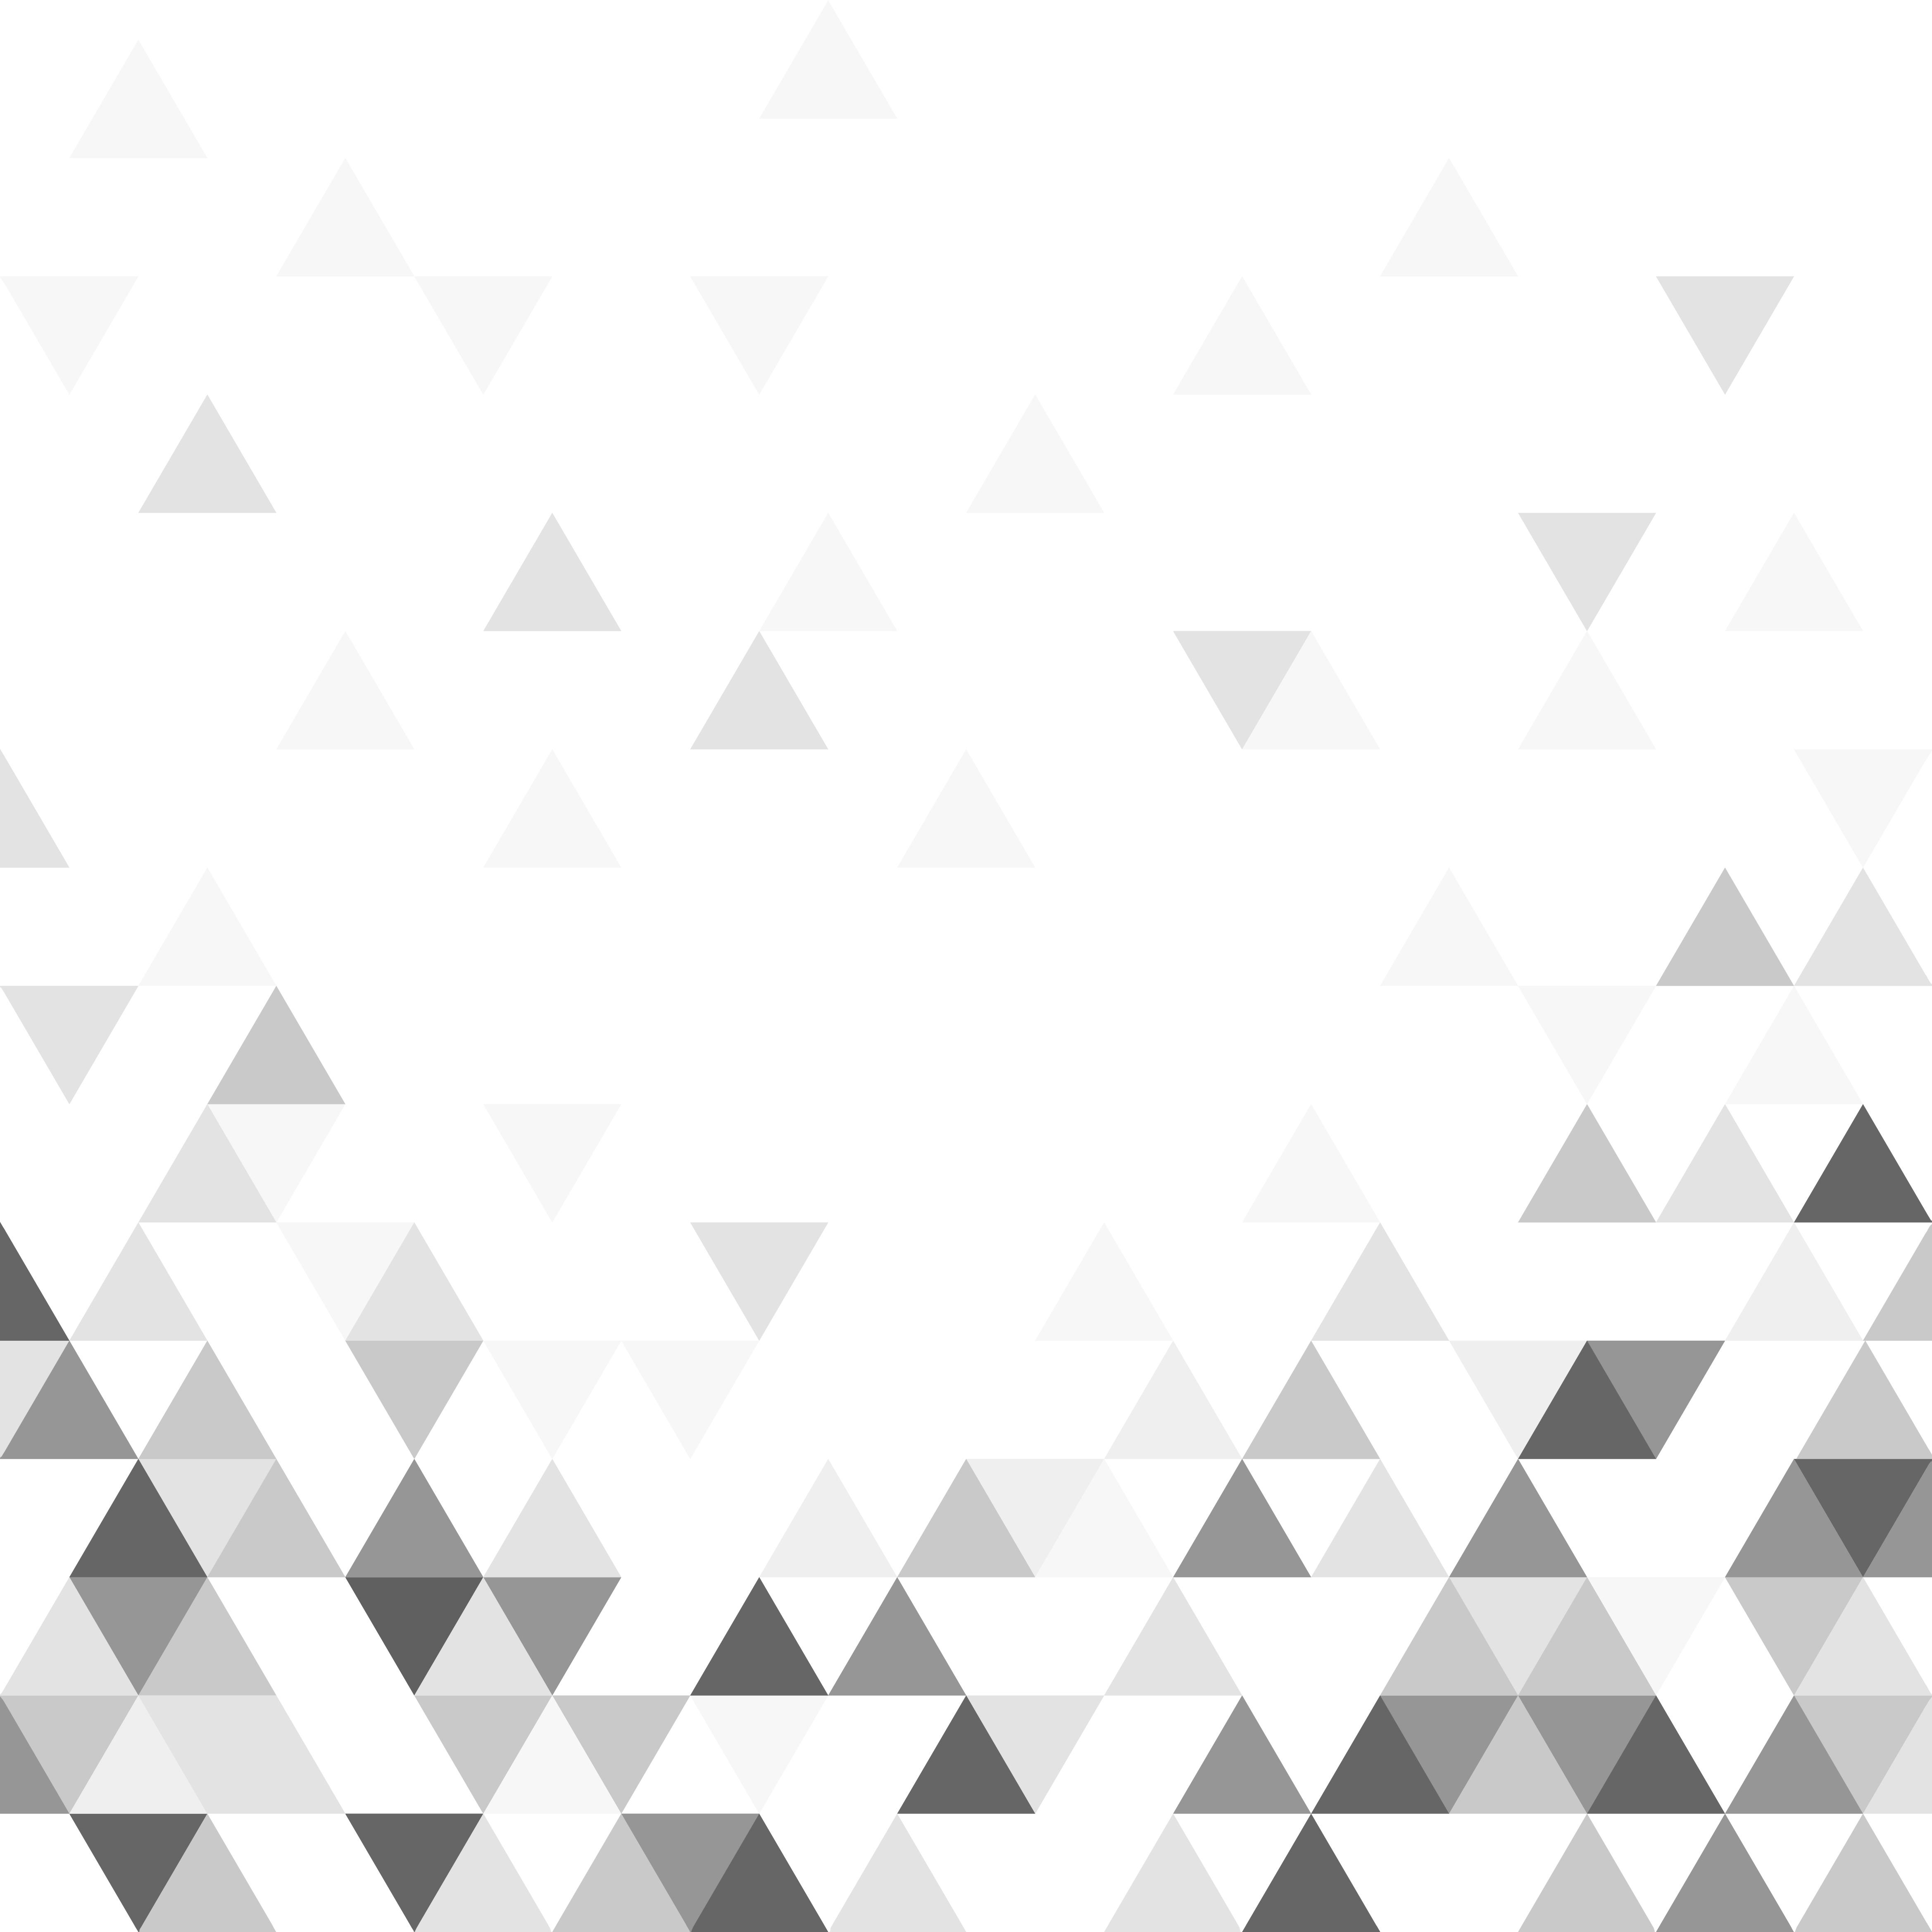 Geometric Triangle Pattern Illustration Download Free